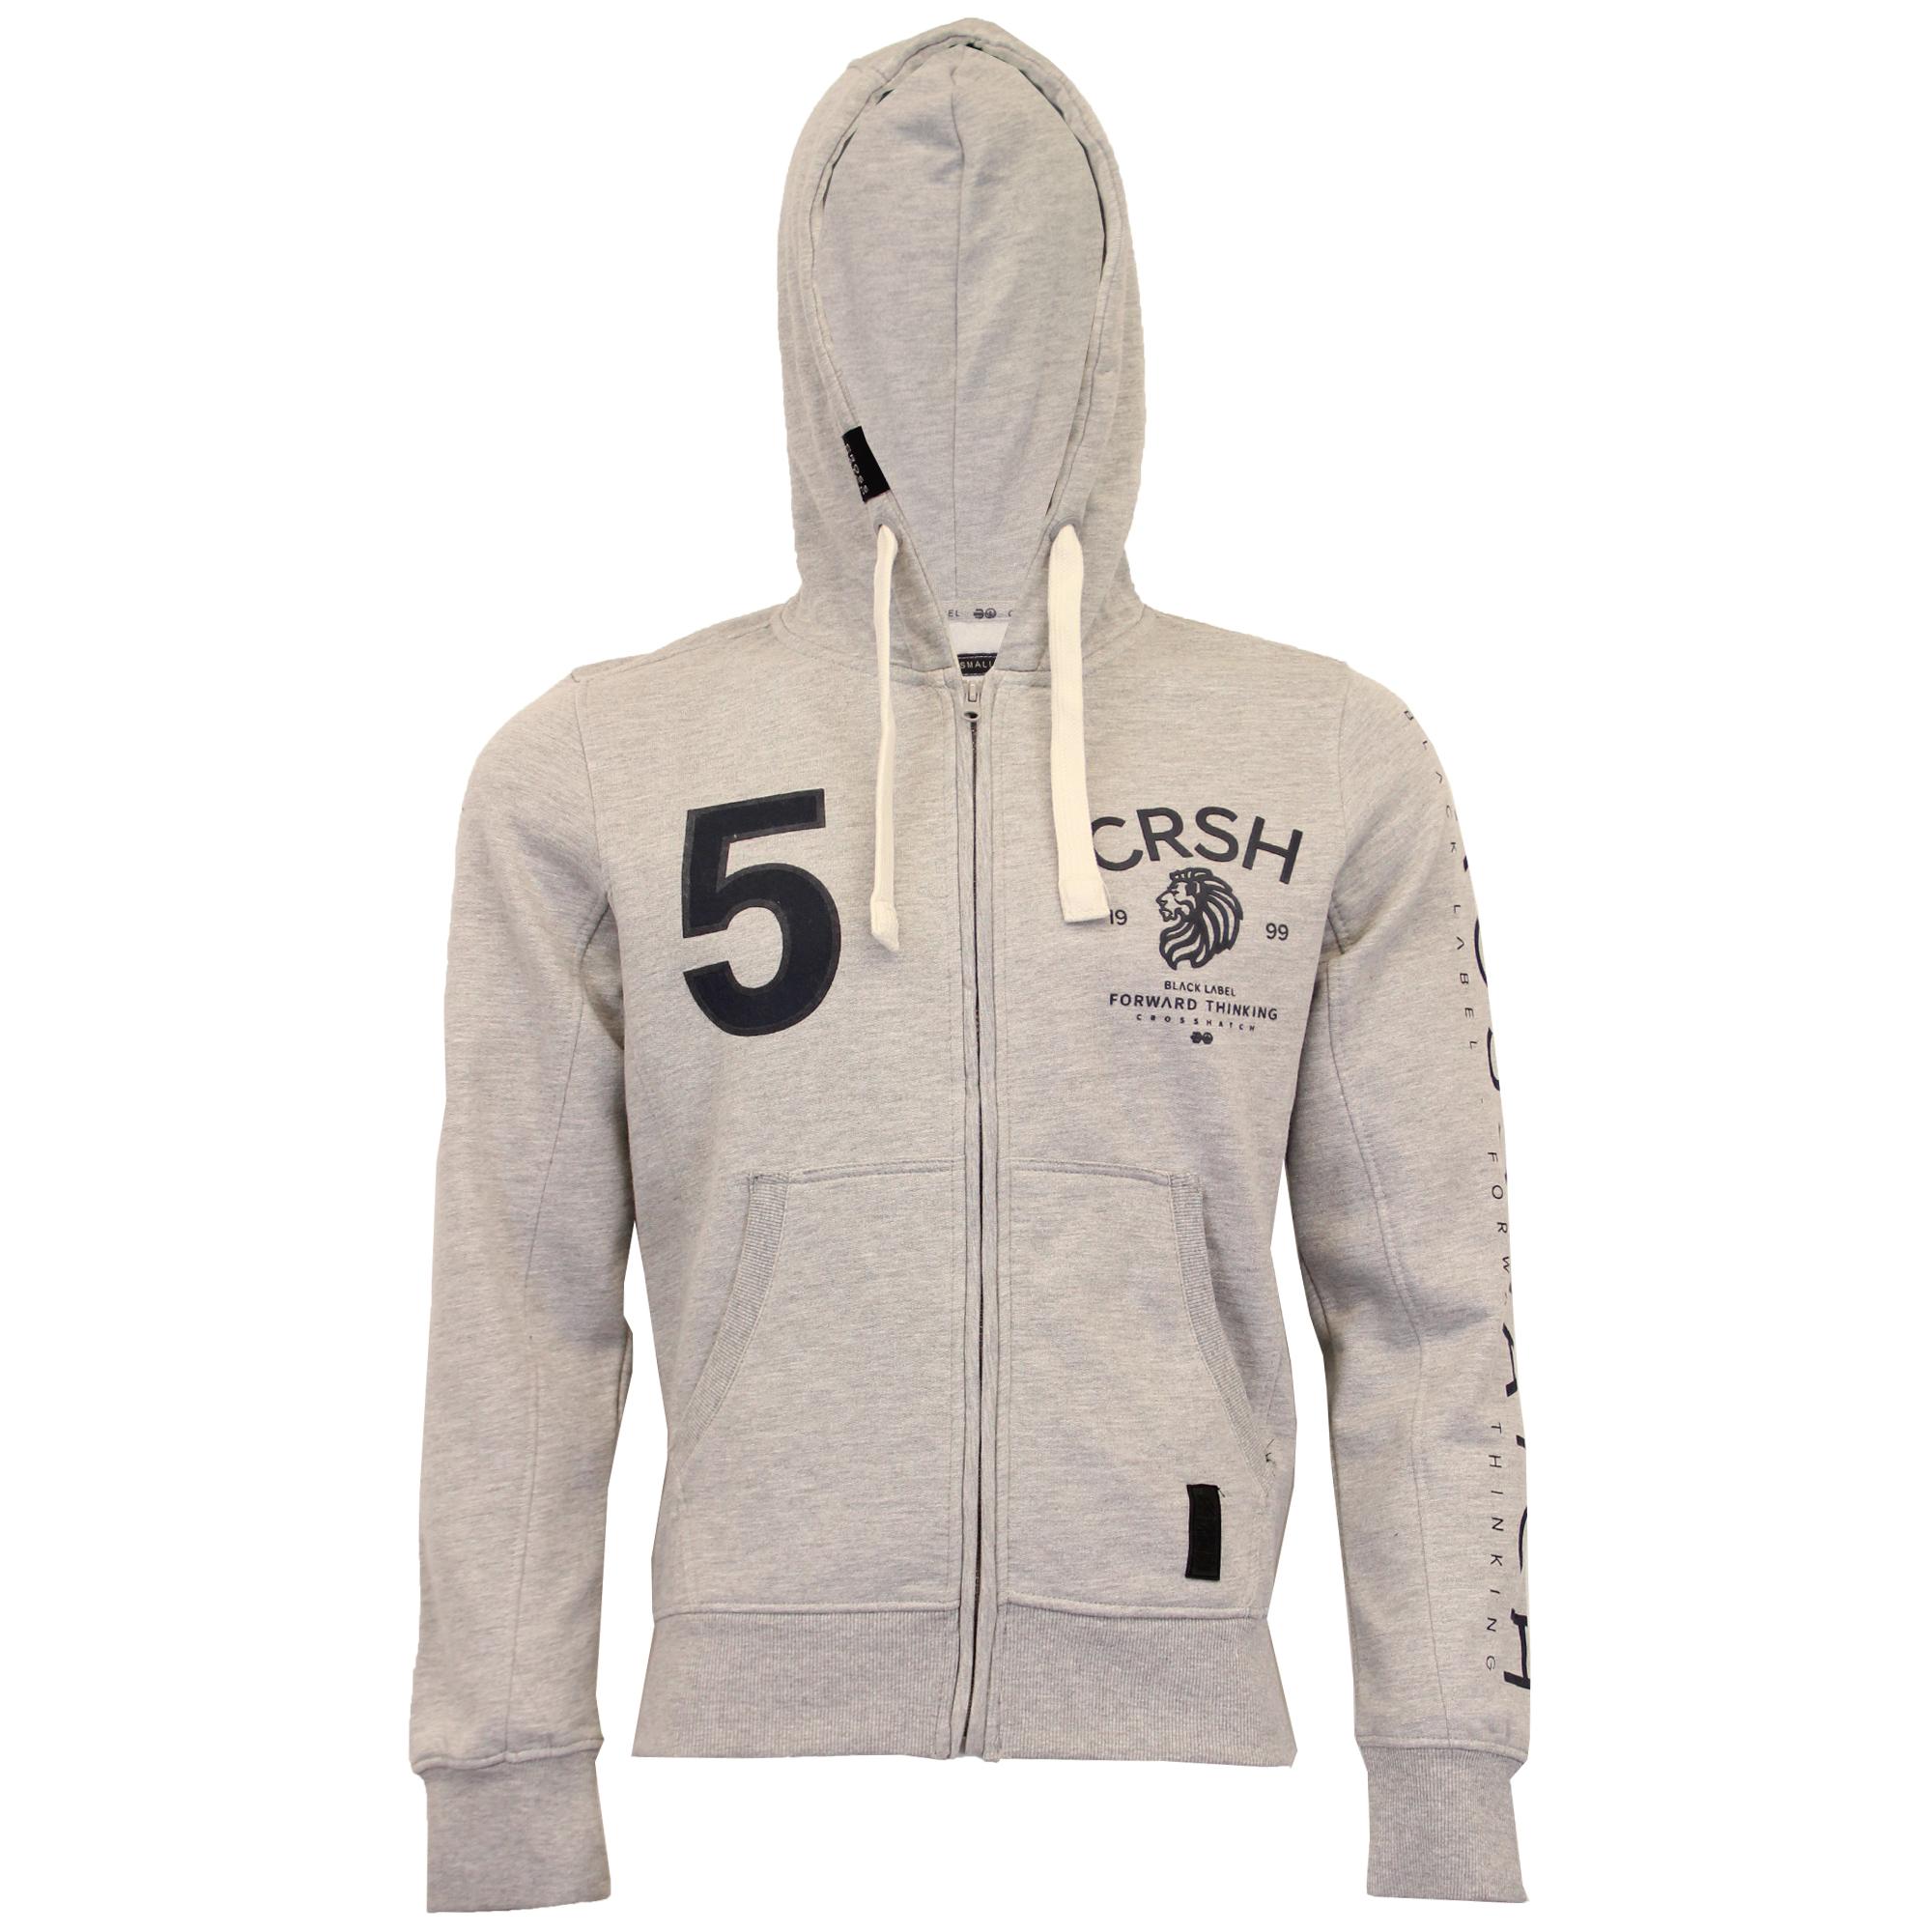 Mens-Sweatshirt-Crosshatch-Hoodie-Top-Embossed-Logo-Print-Sweat-Fleece-Lined-New thumbnail 12